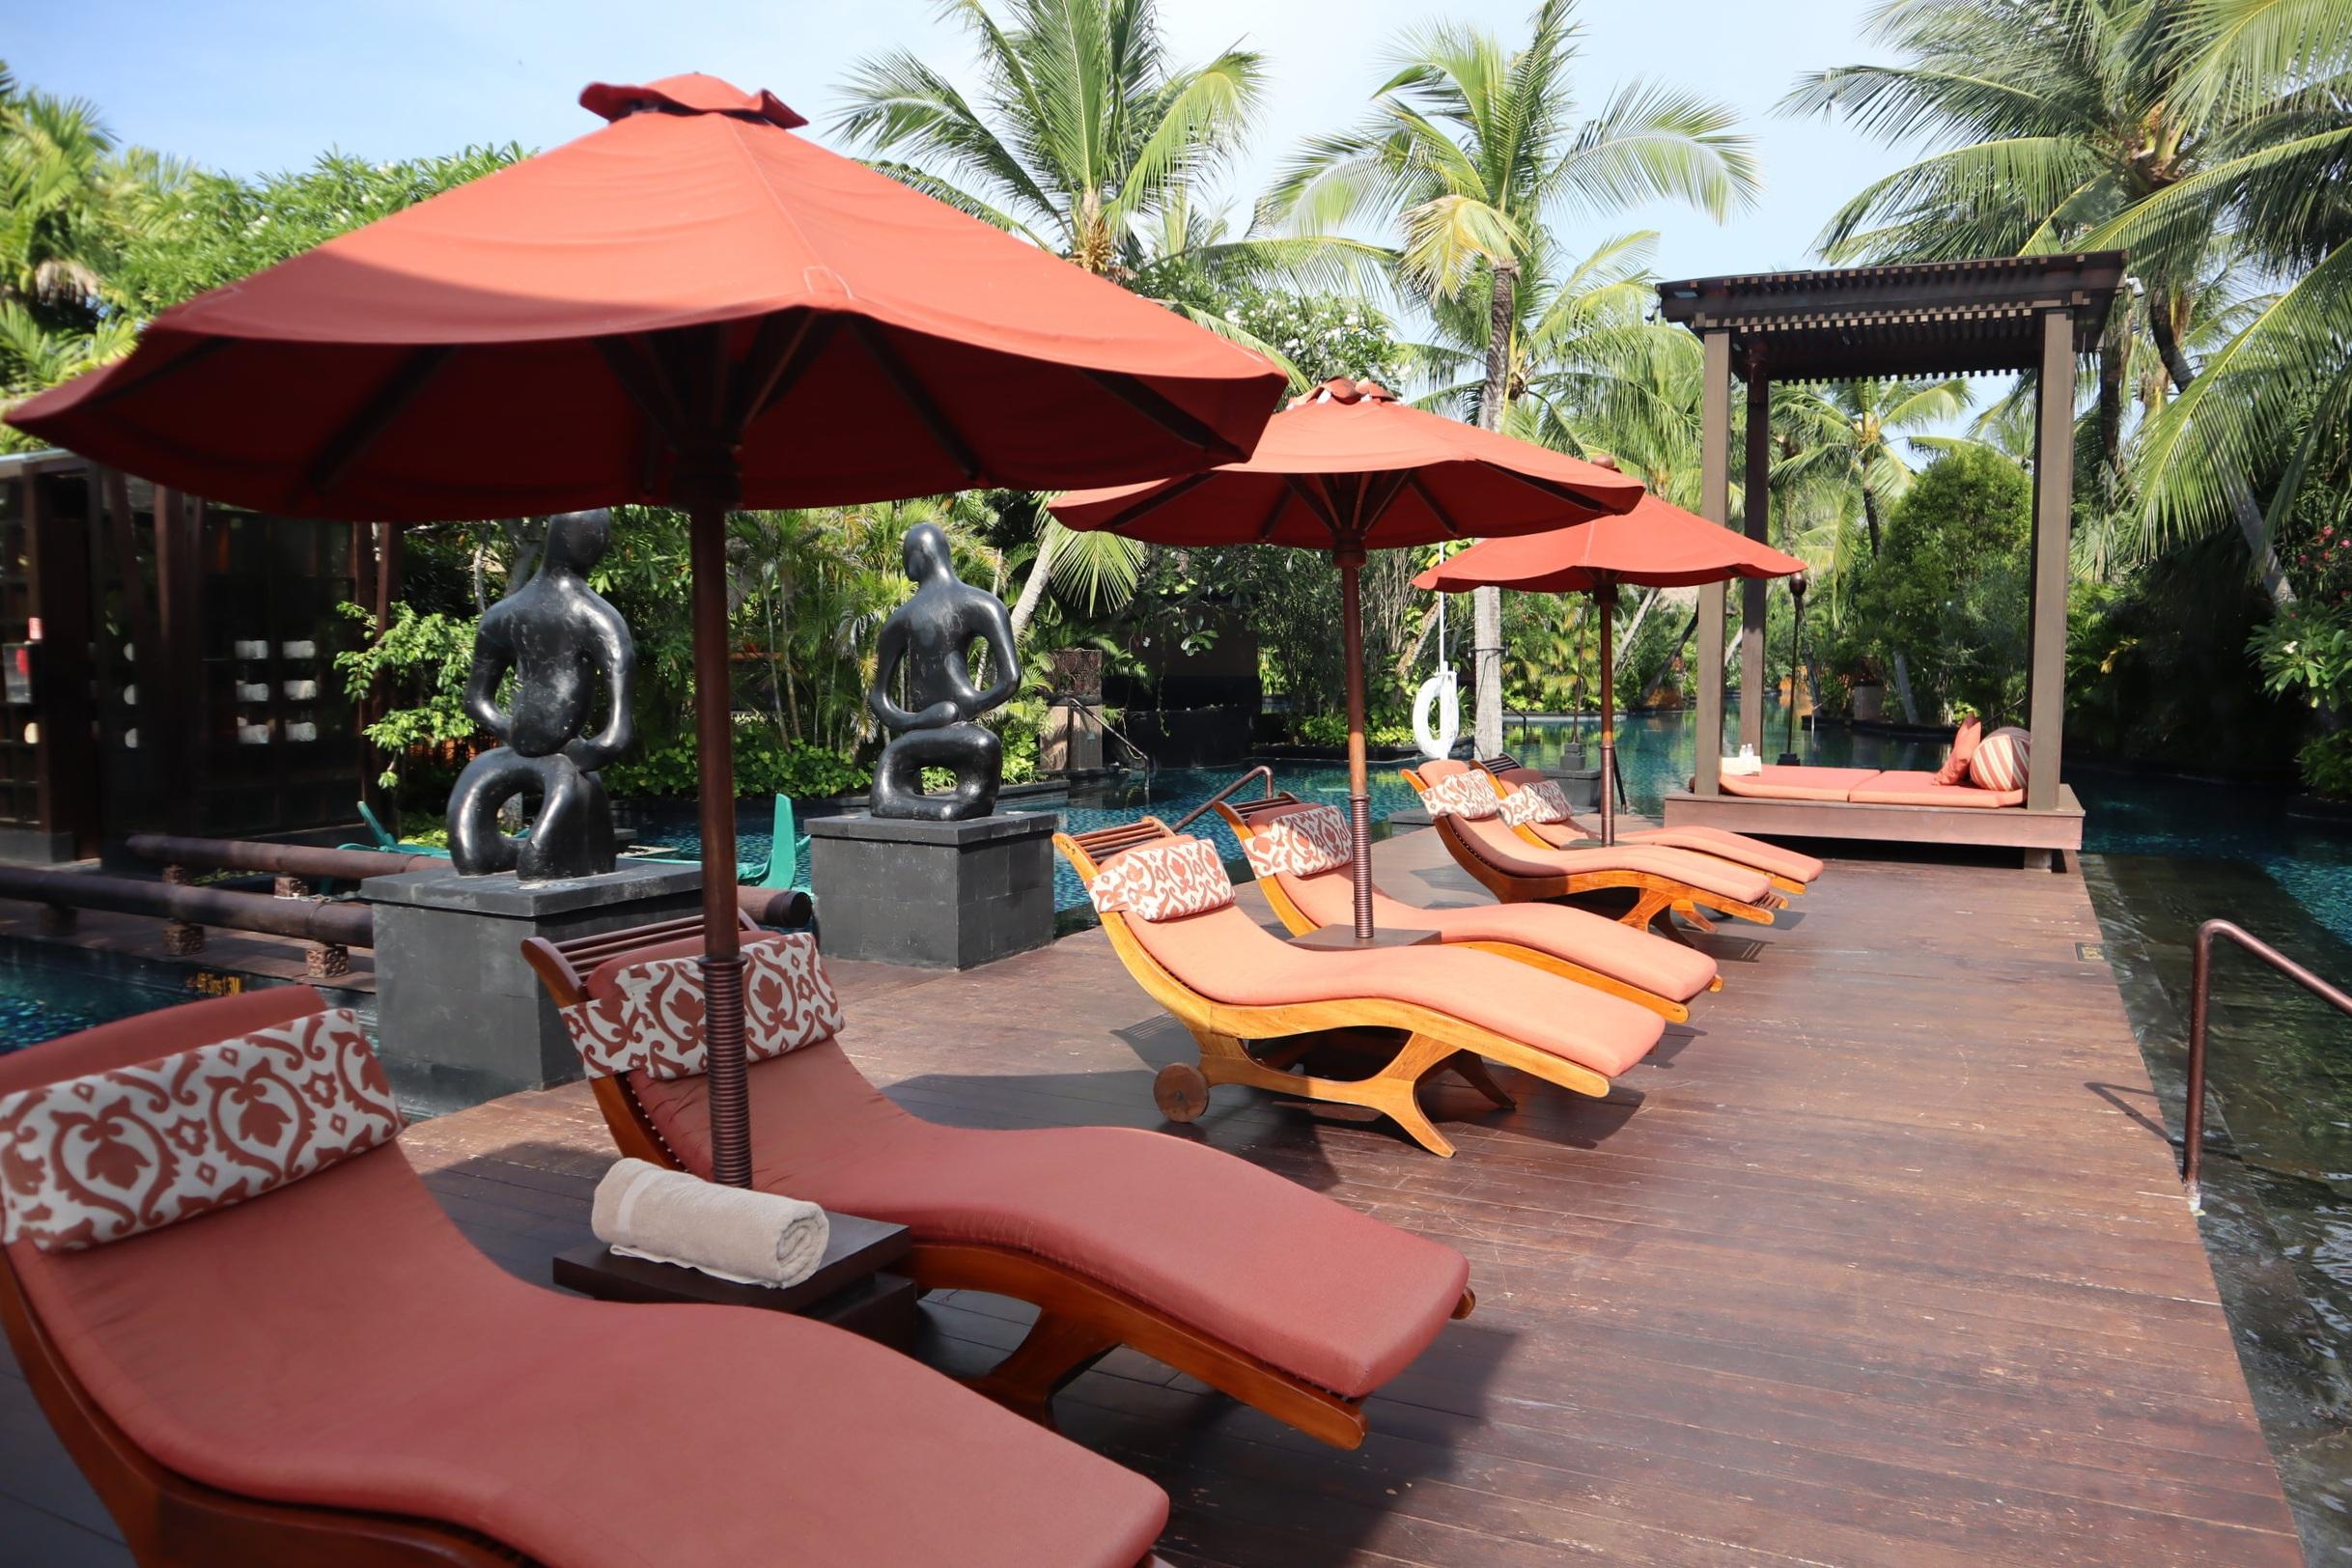 St. Regis Bali – Saltwater lagoon cabanas